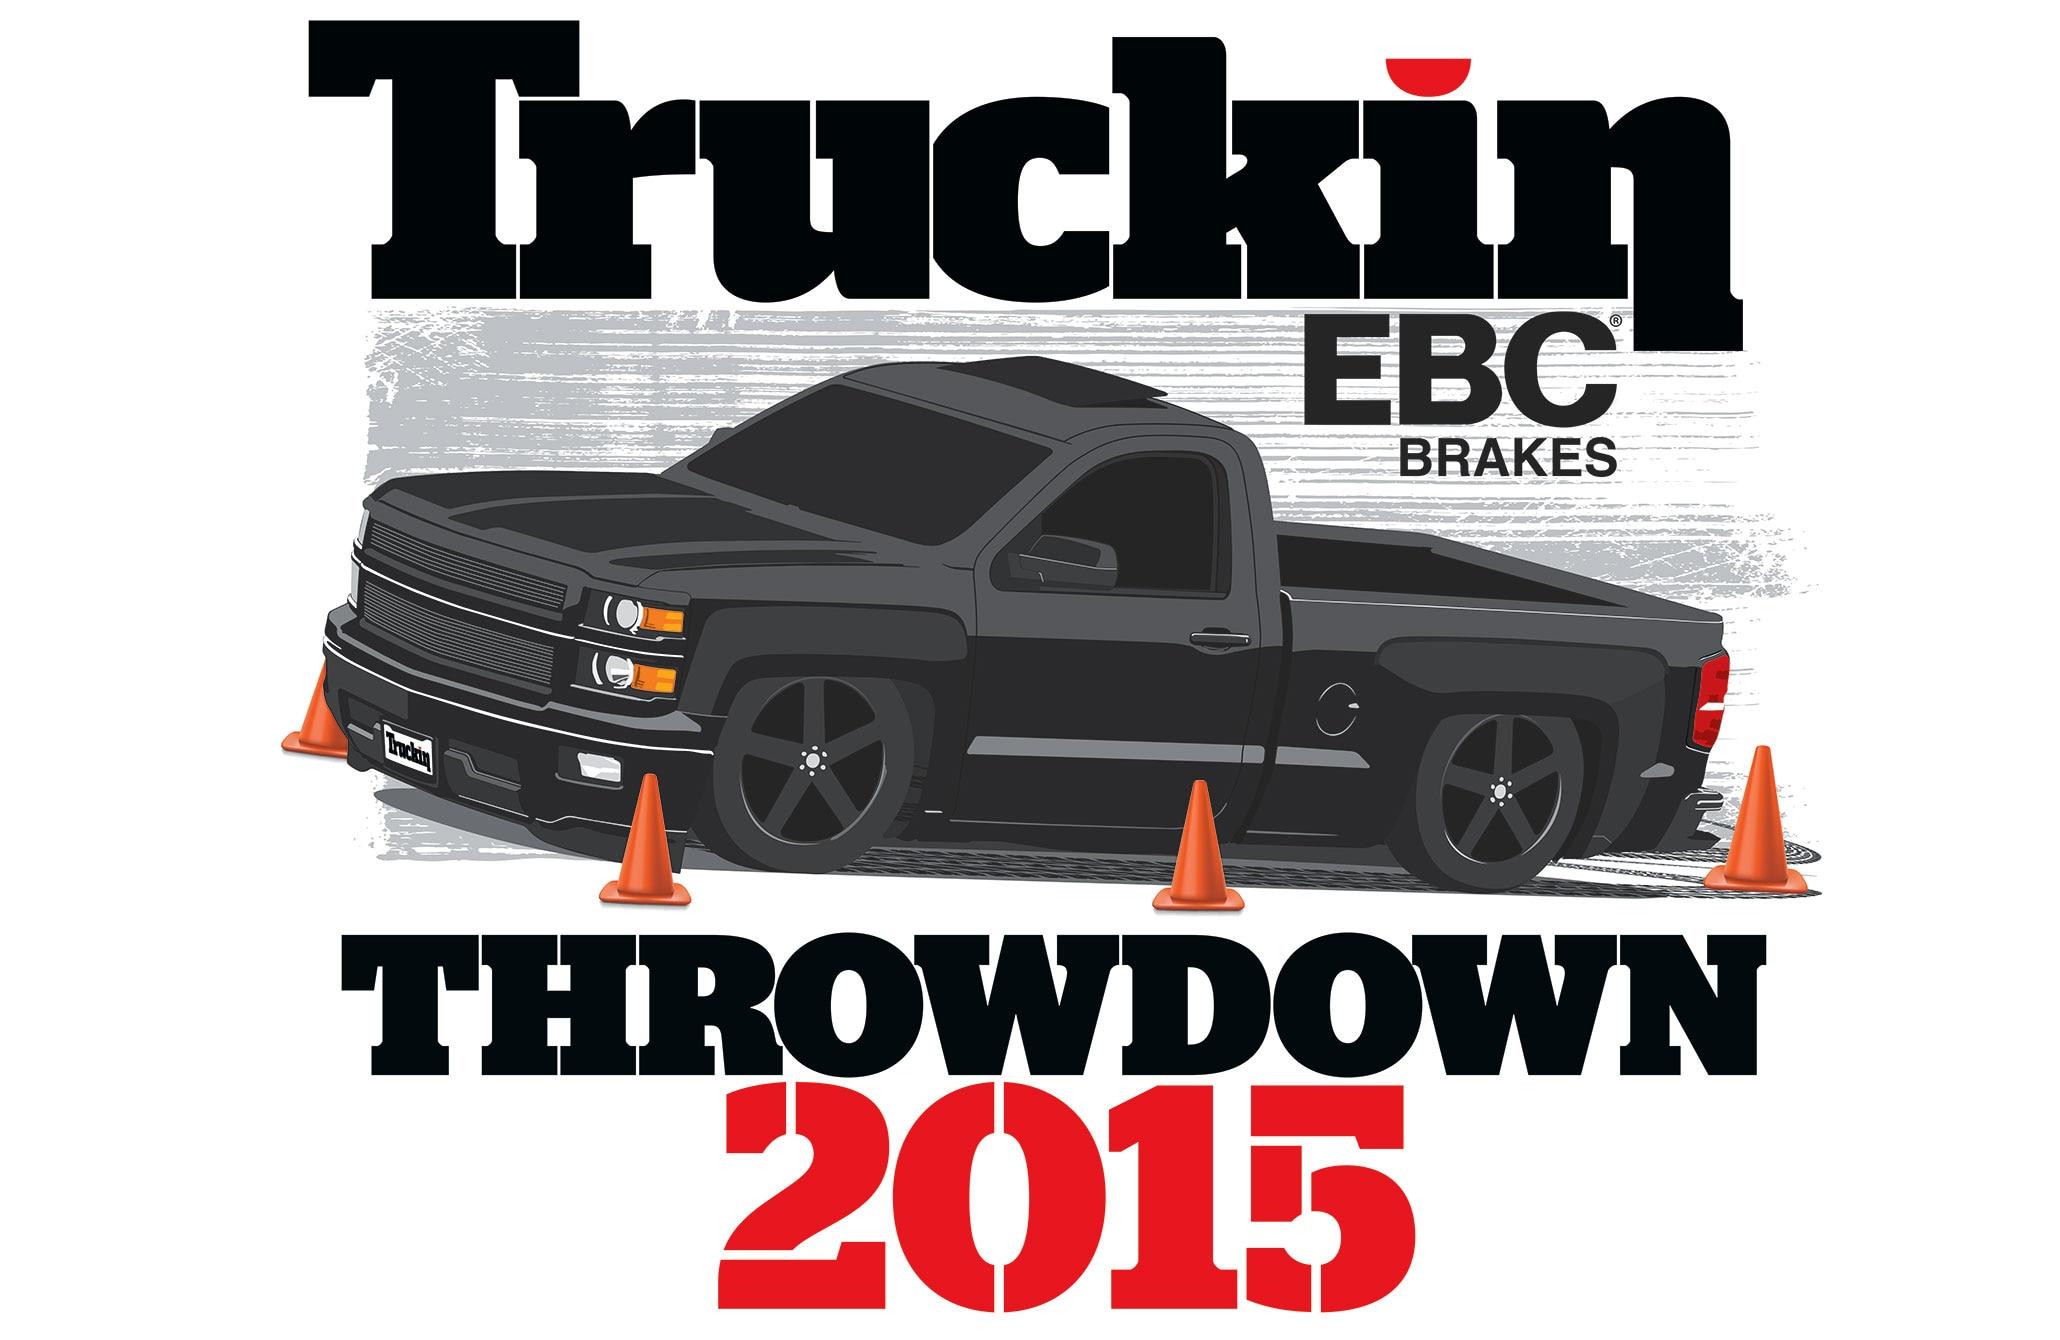 2015 Truckin Throwdown - Presented by EBC Brakes